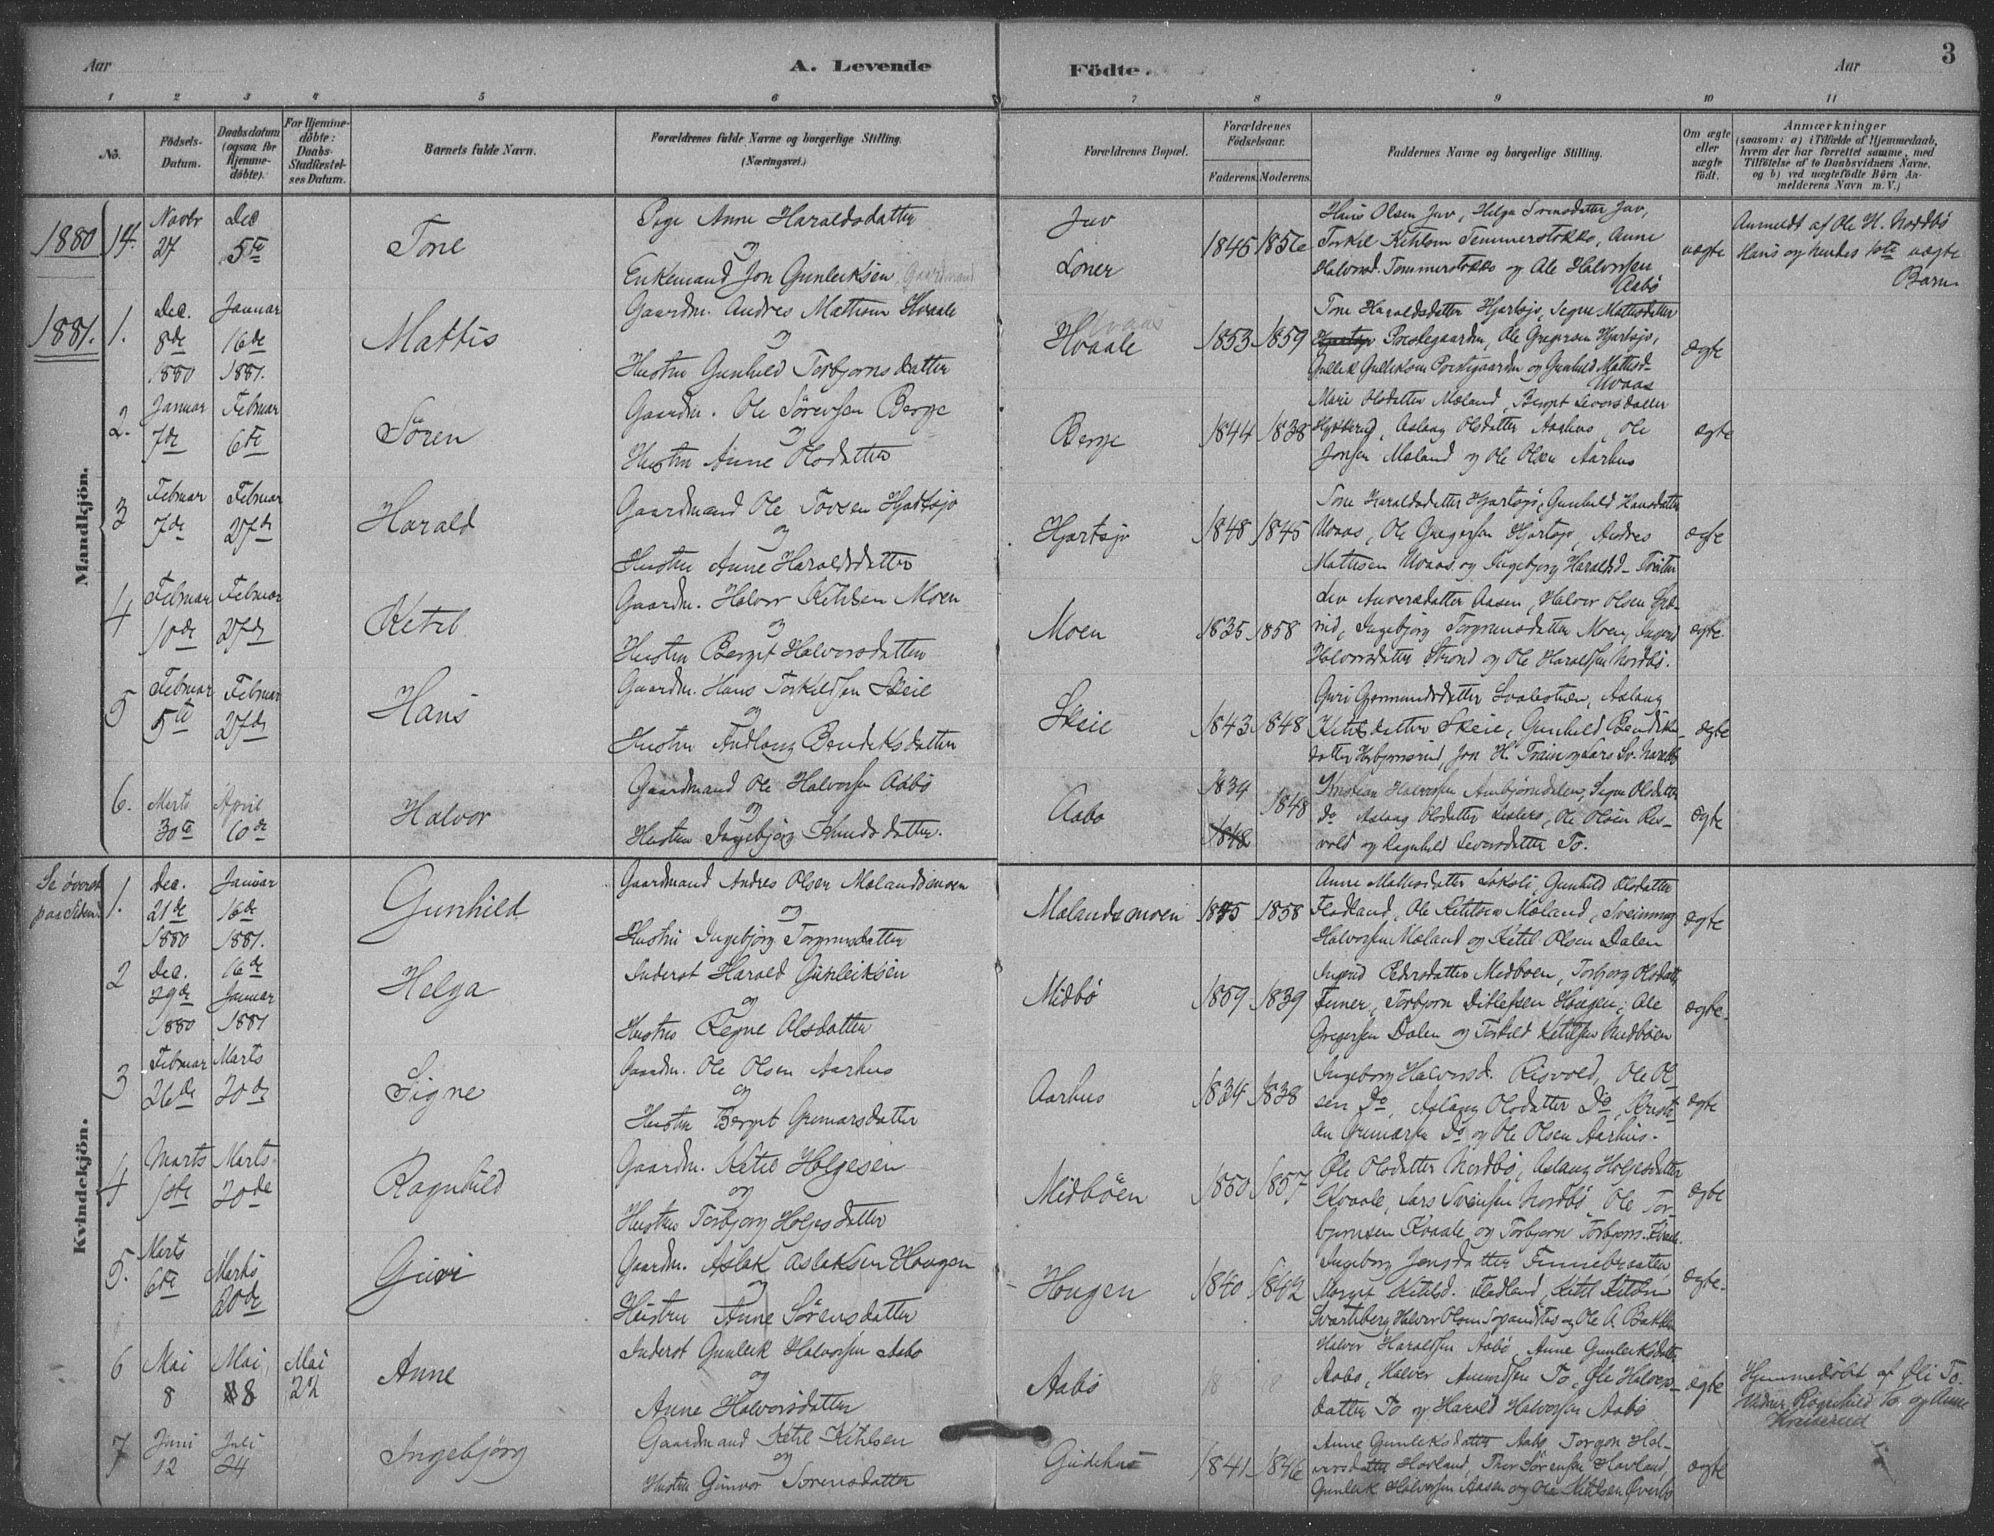 SAKO, Hjartdal kirkebøker, F/Fa/L0010: Ministerialbok nr. I 10, 1880-1929, s. 3